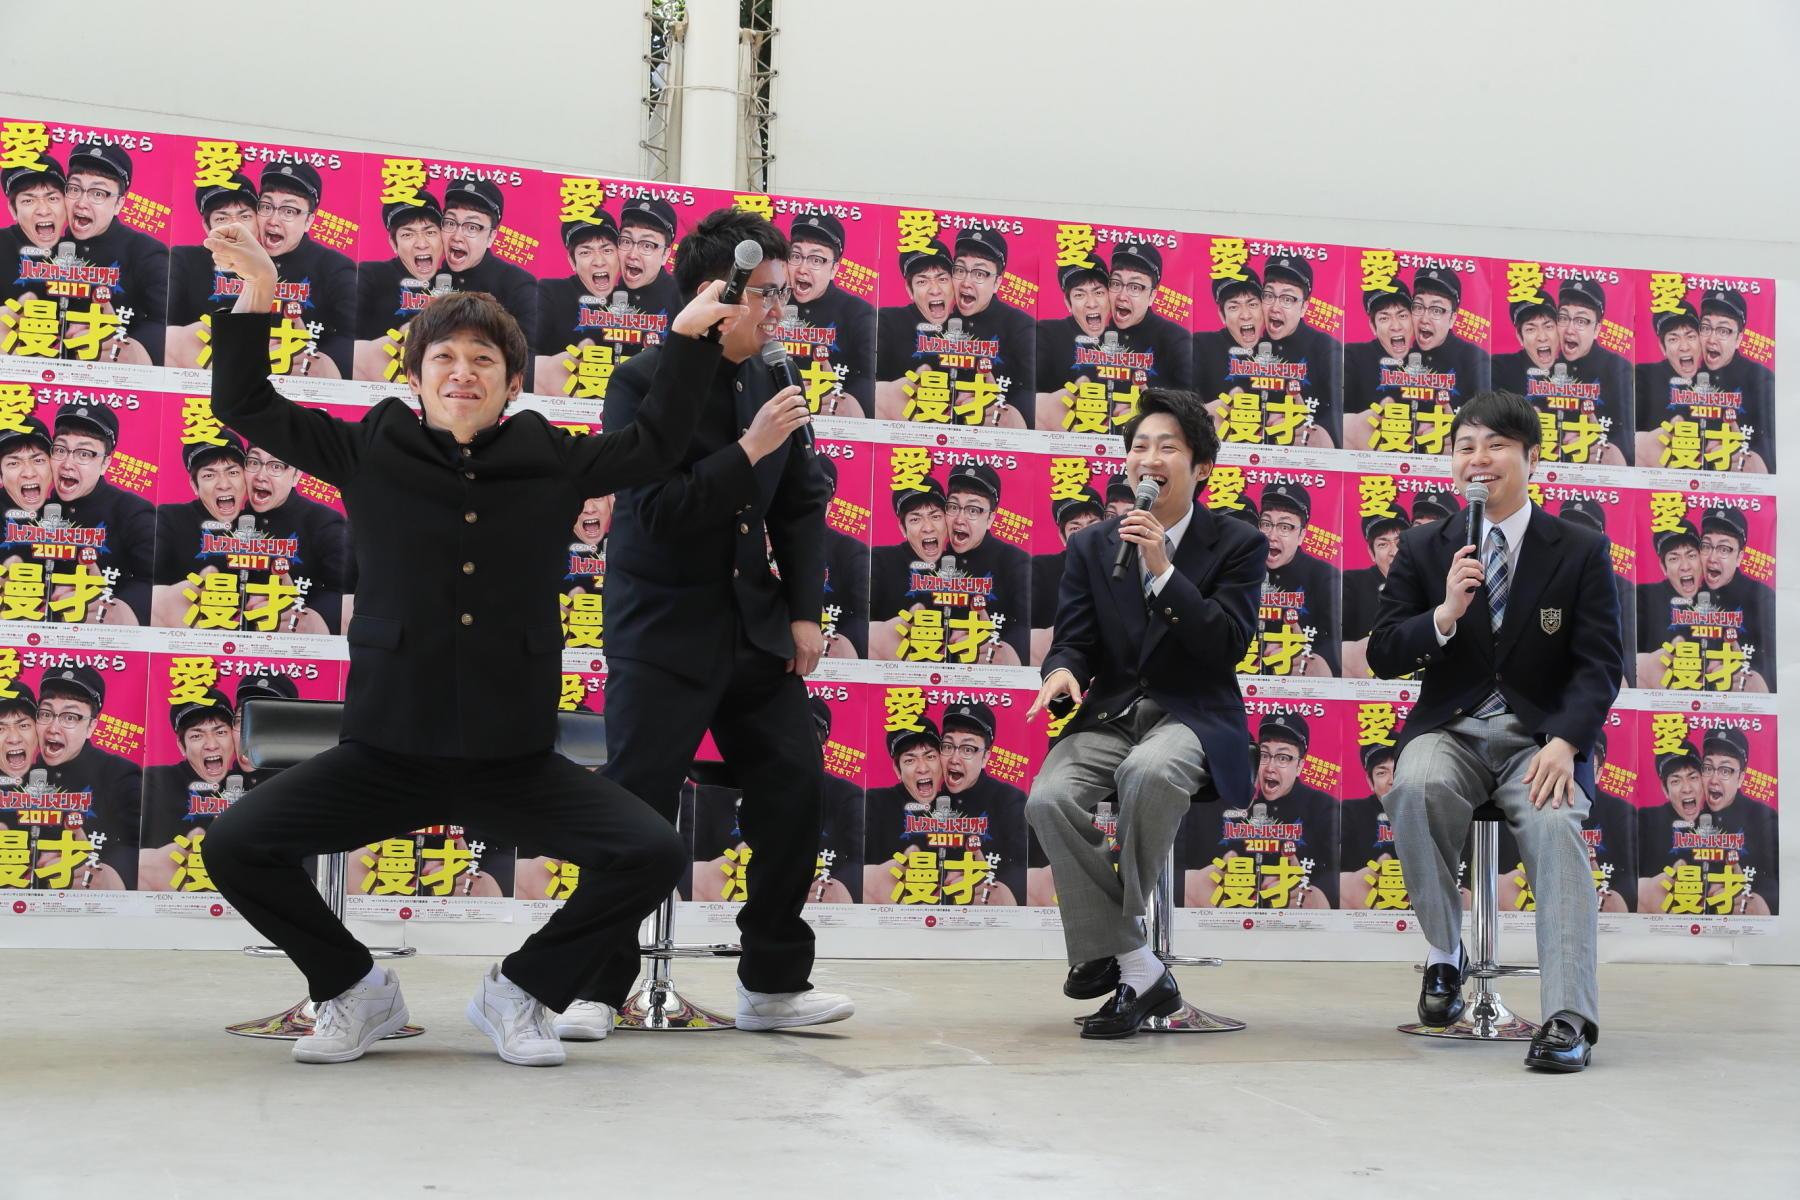 http://news.yoshimoto.co.jp/20170413154330-60198dd14f88feec33463217c54995ca3a35f823.jpg